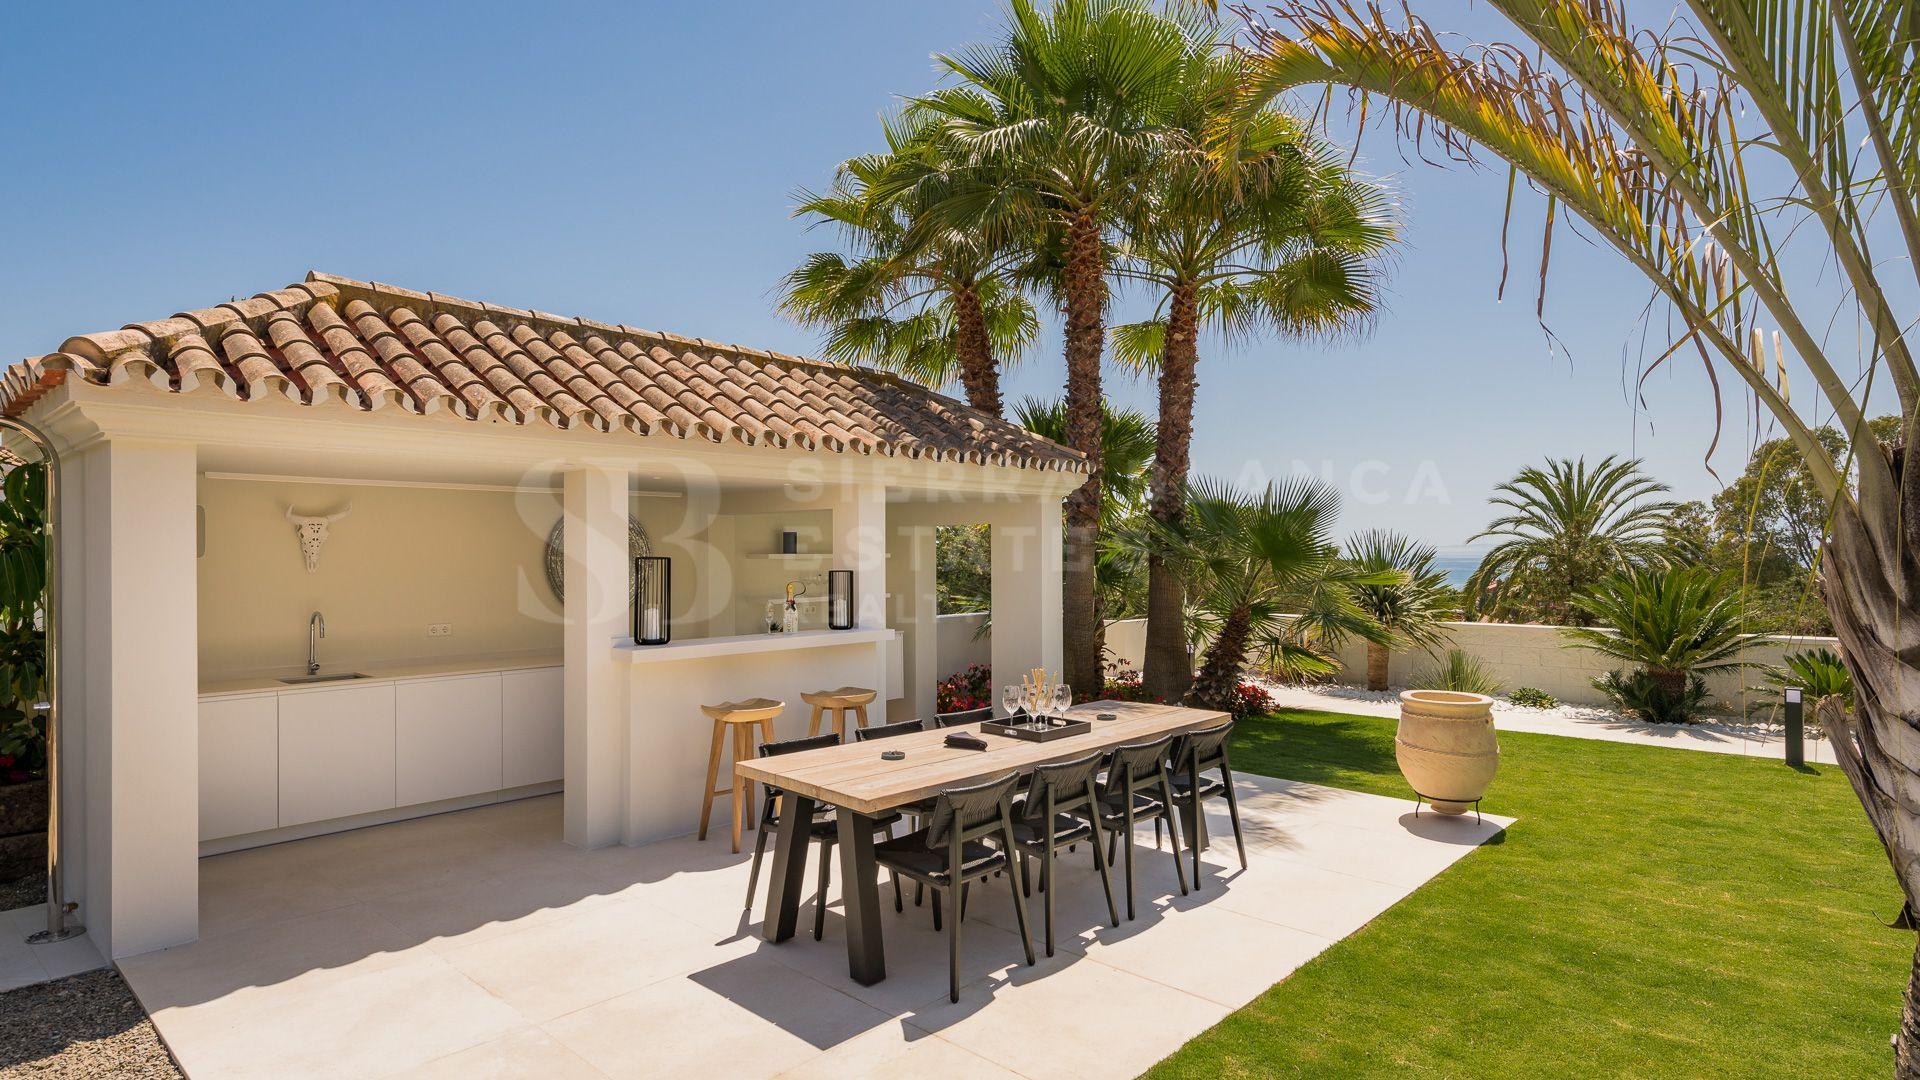 Beautiful Villa with Andalusian Design in Elviria